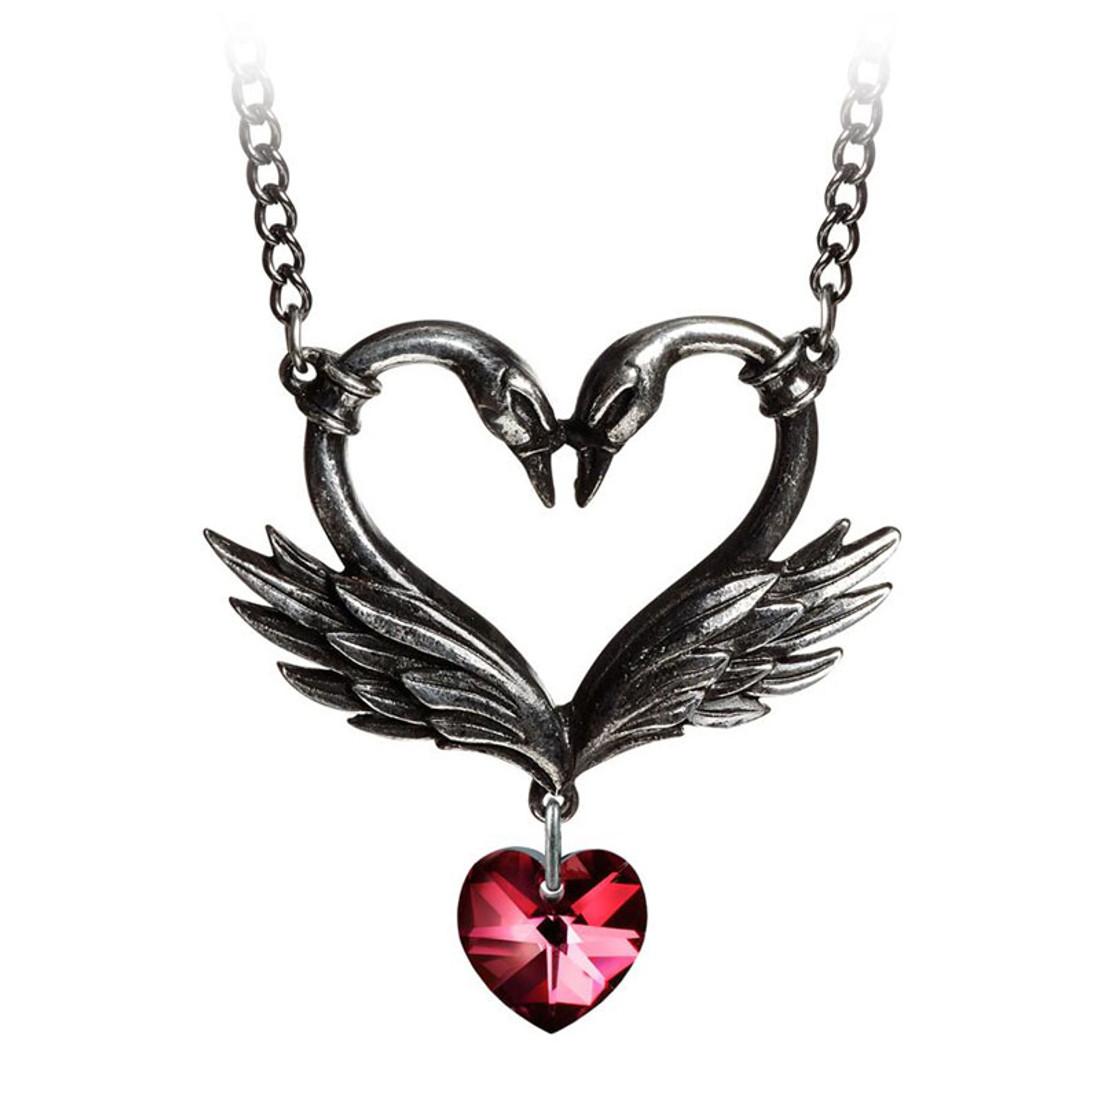 Alchemy Gothic - P773 - The Black Swan Romance Necklace